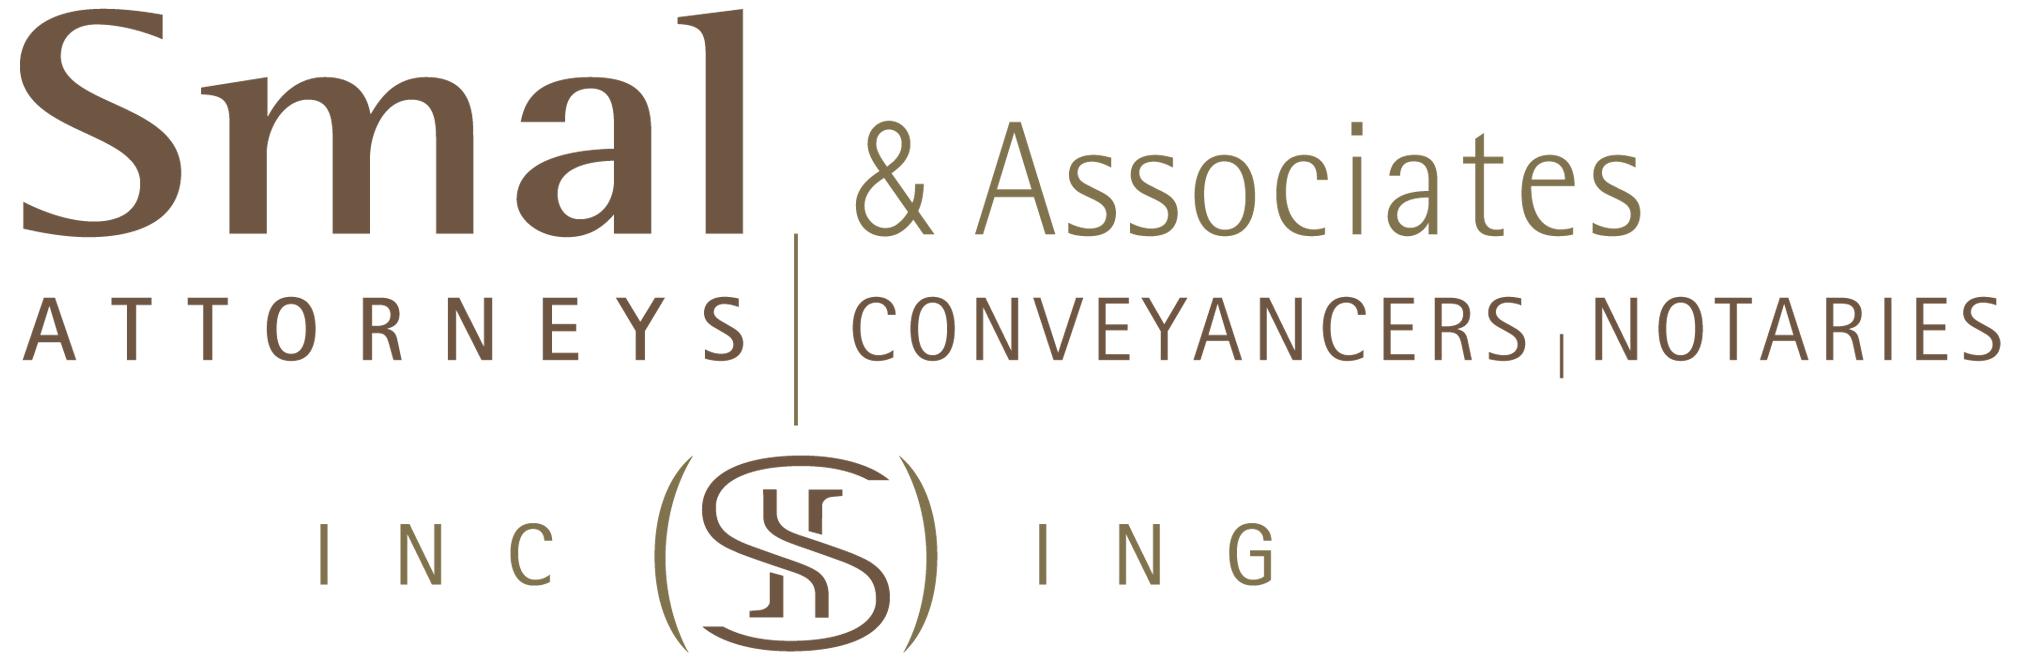 SMALA-logo4web-3